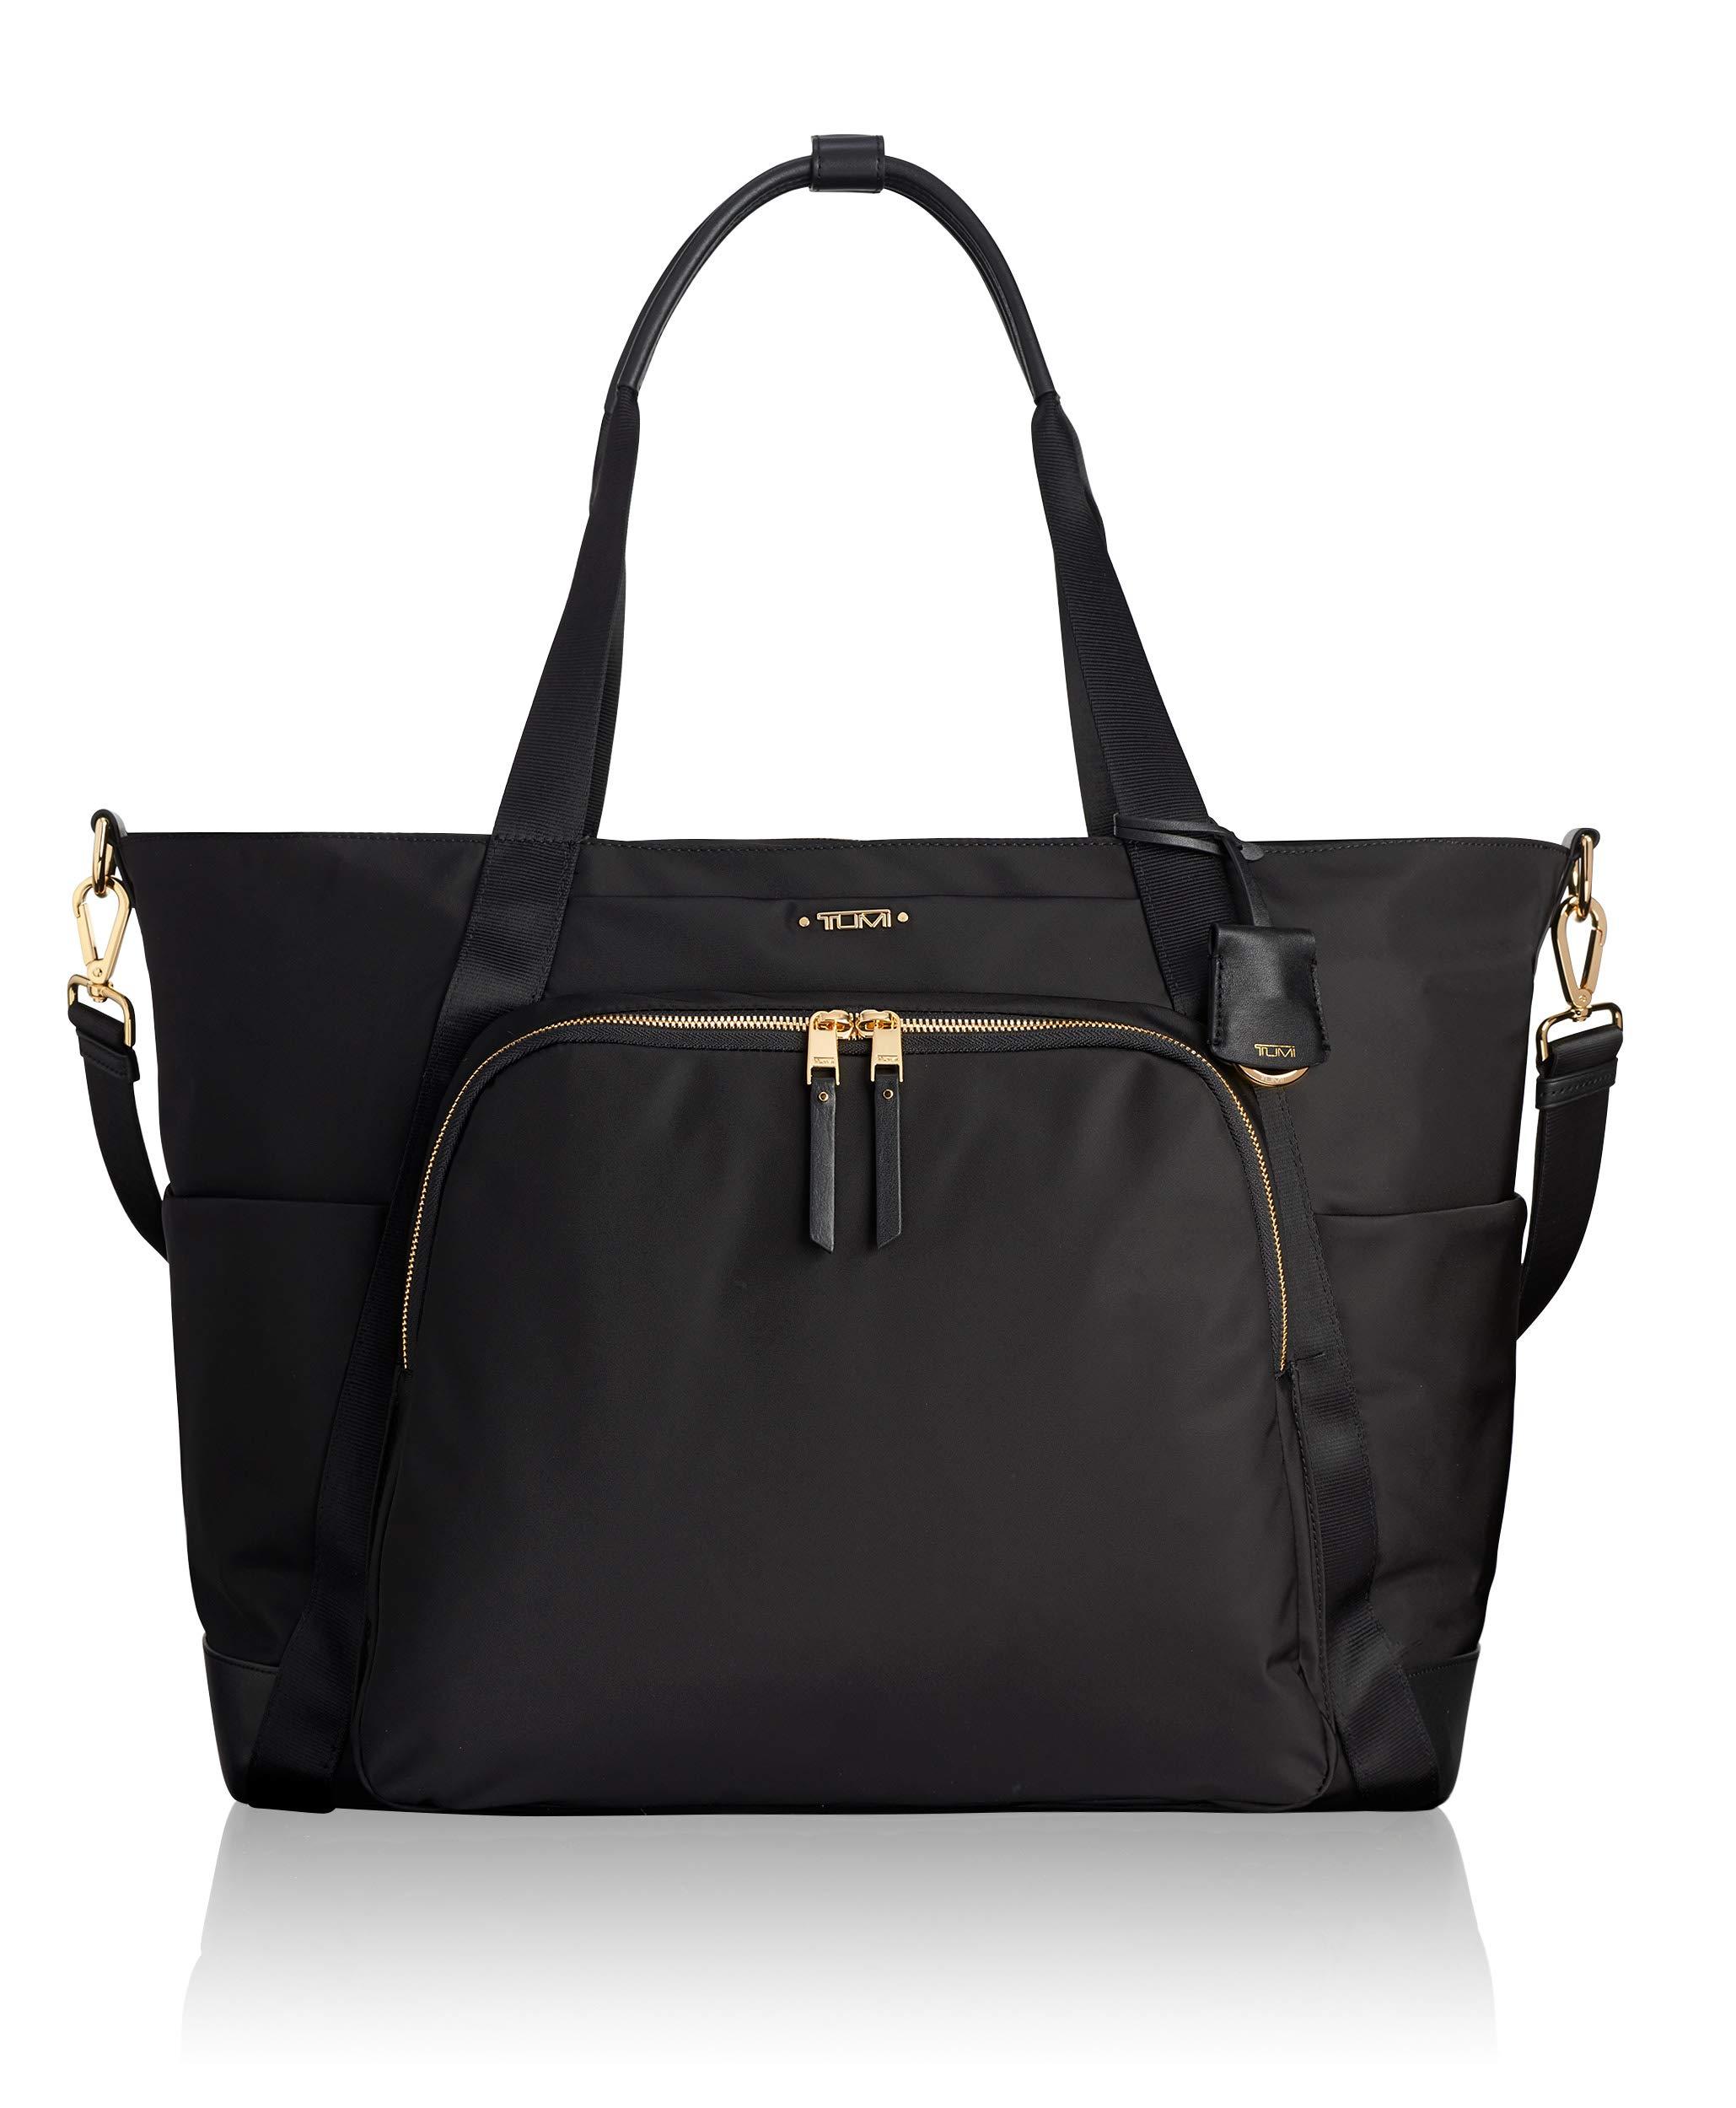 TUMI - Voyageur Madrid Duffel Bag - Shoulder Strap Tote Bag for Women - Black